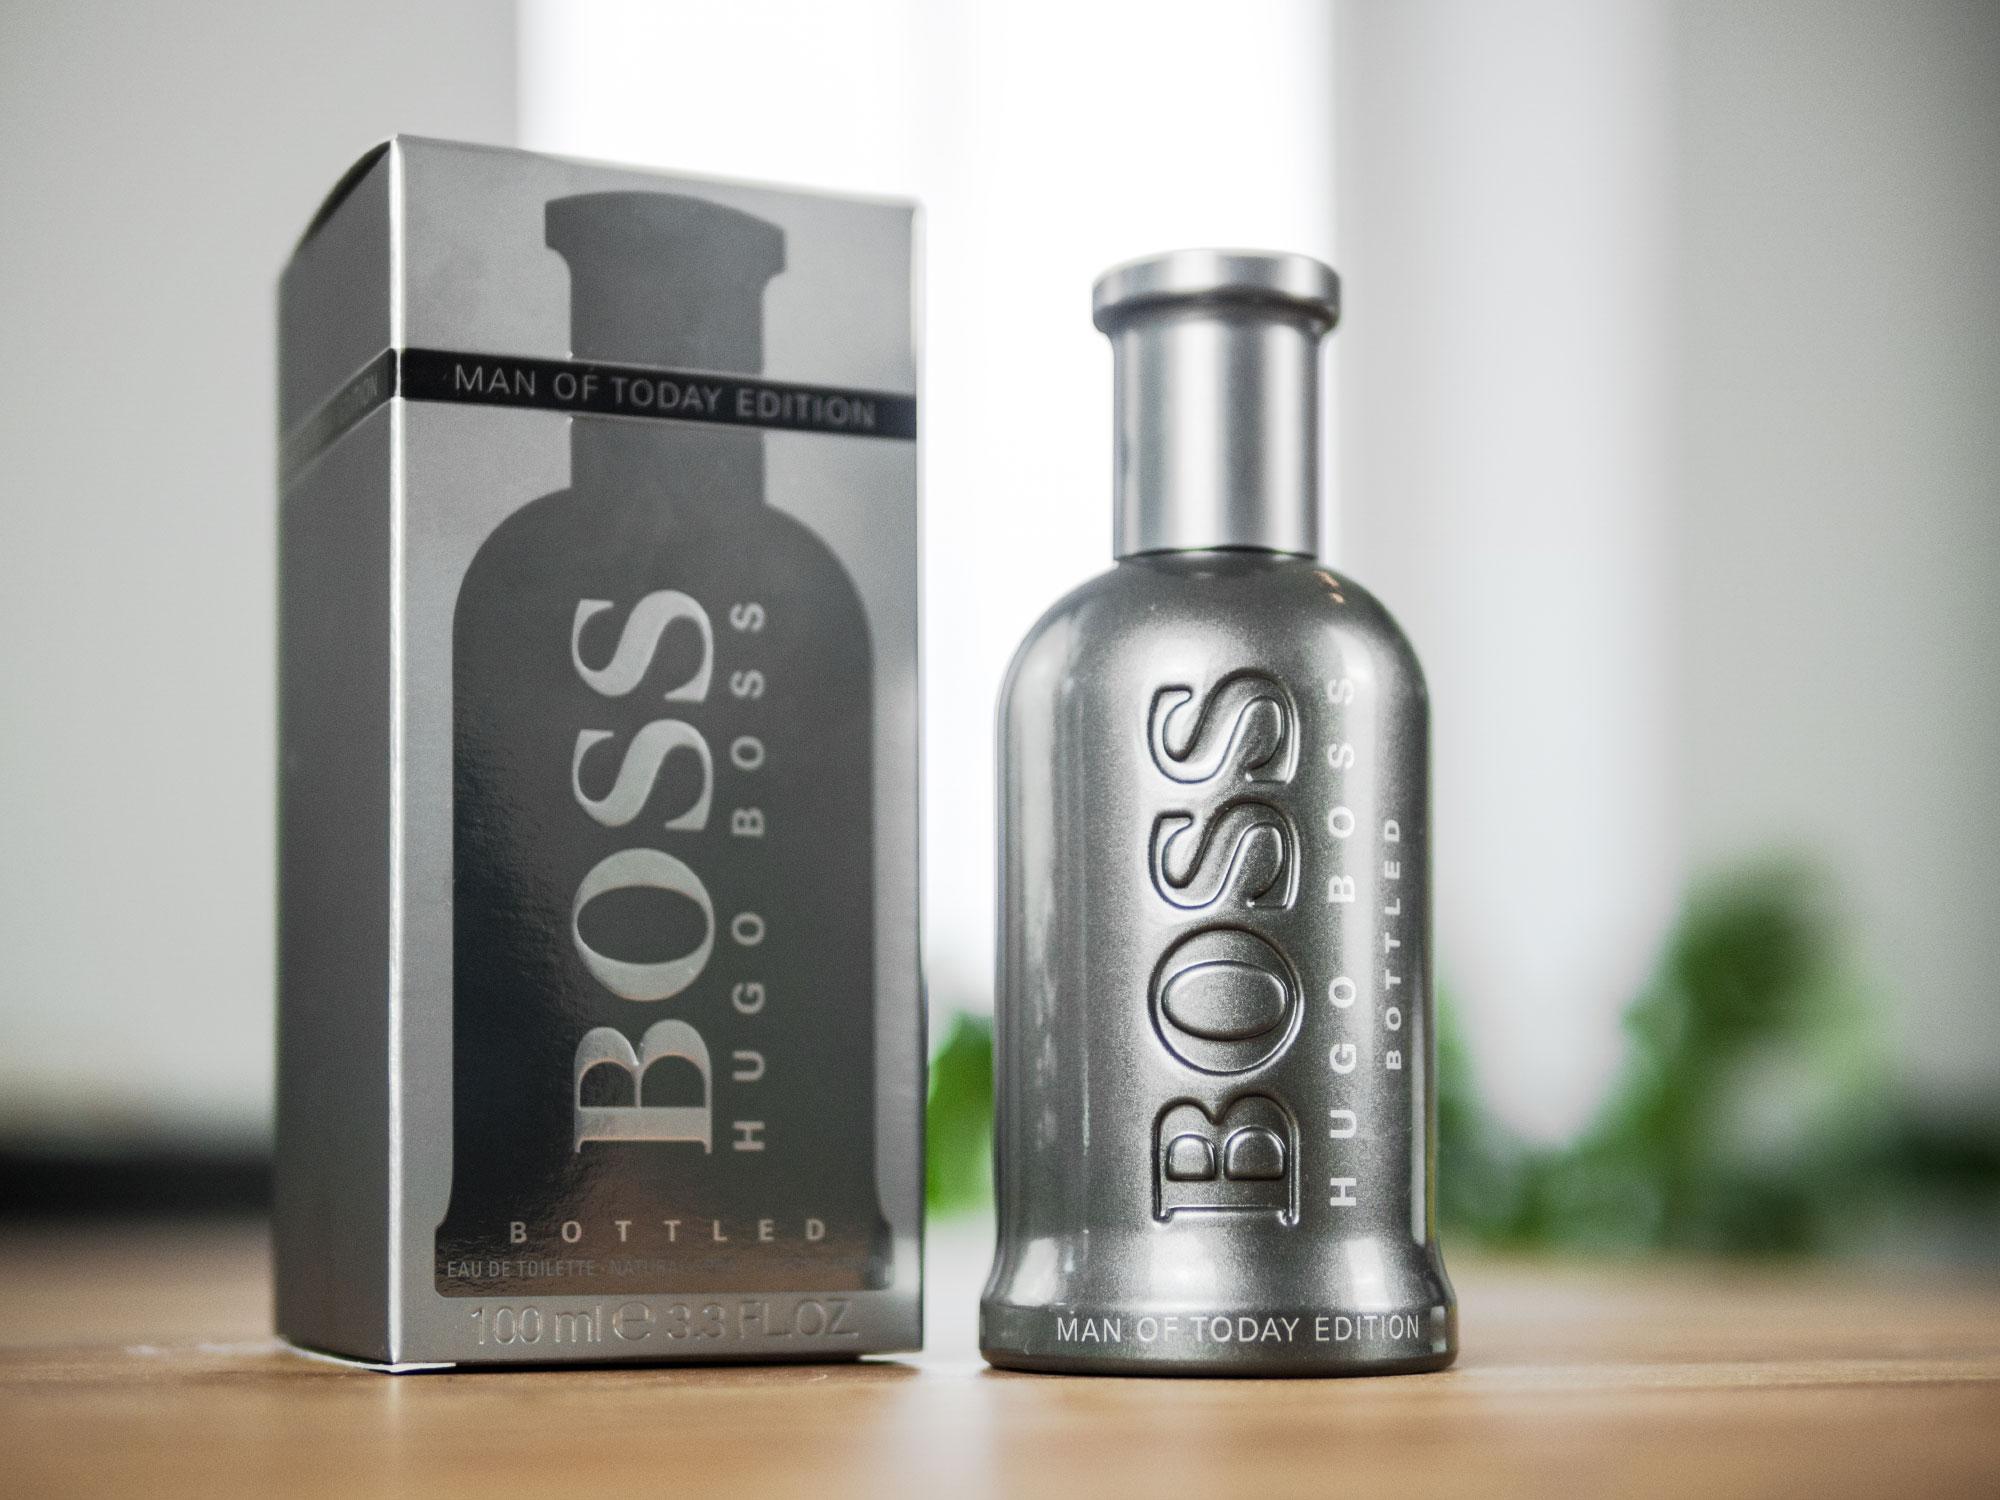 hugo boss boss bottled man of today edition. Black Bedroom Furniture Sets. Home Design Ideas